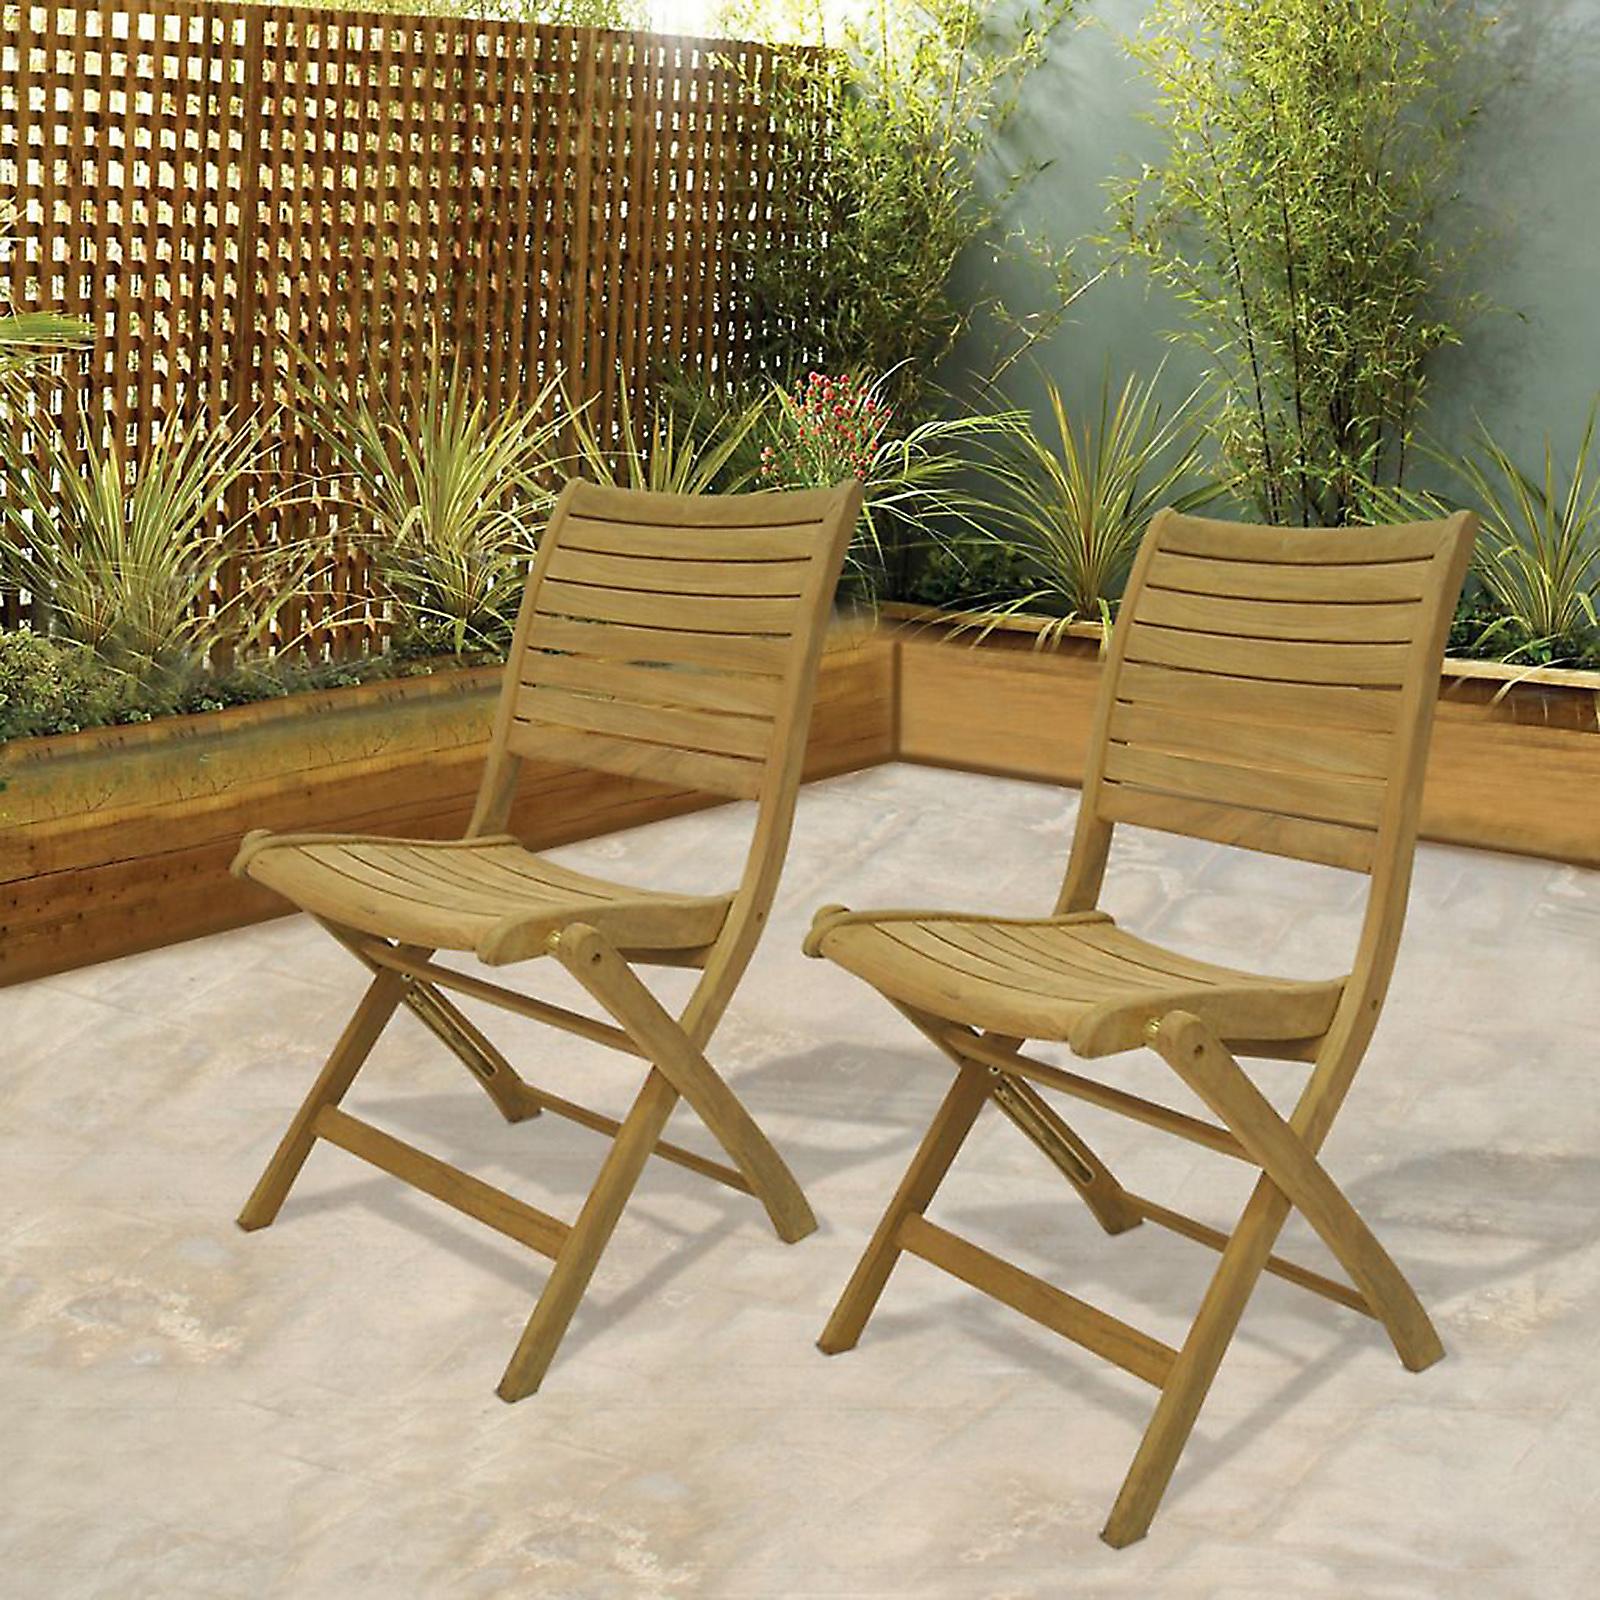 Amazonia Cabana 2 Piece Teak Wood Folding Patio Chair Set